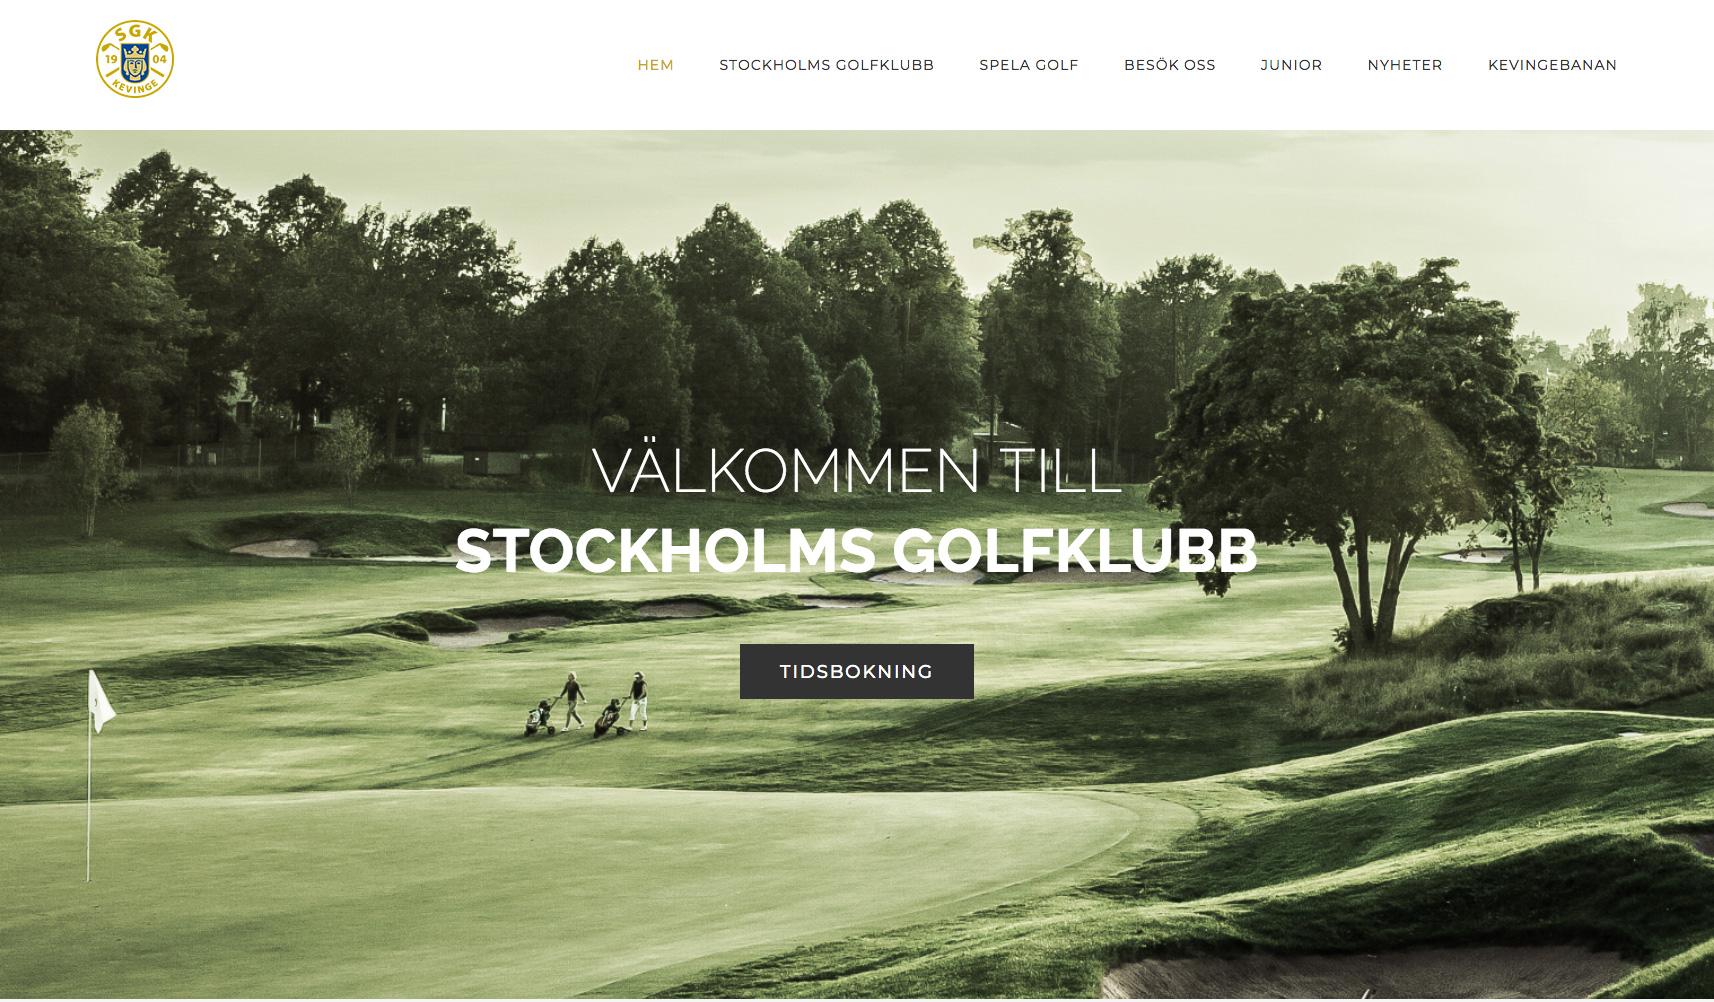 Stockholms Golfklubb släpper sin nya hemsida